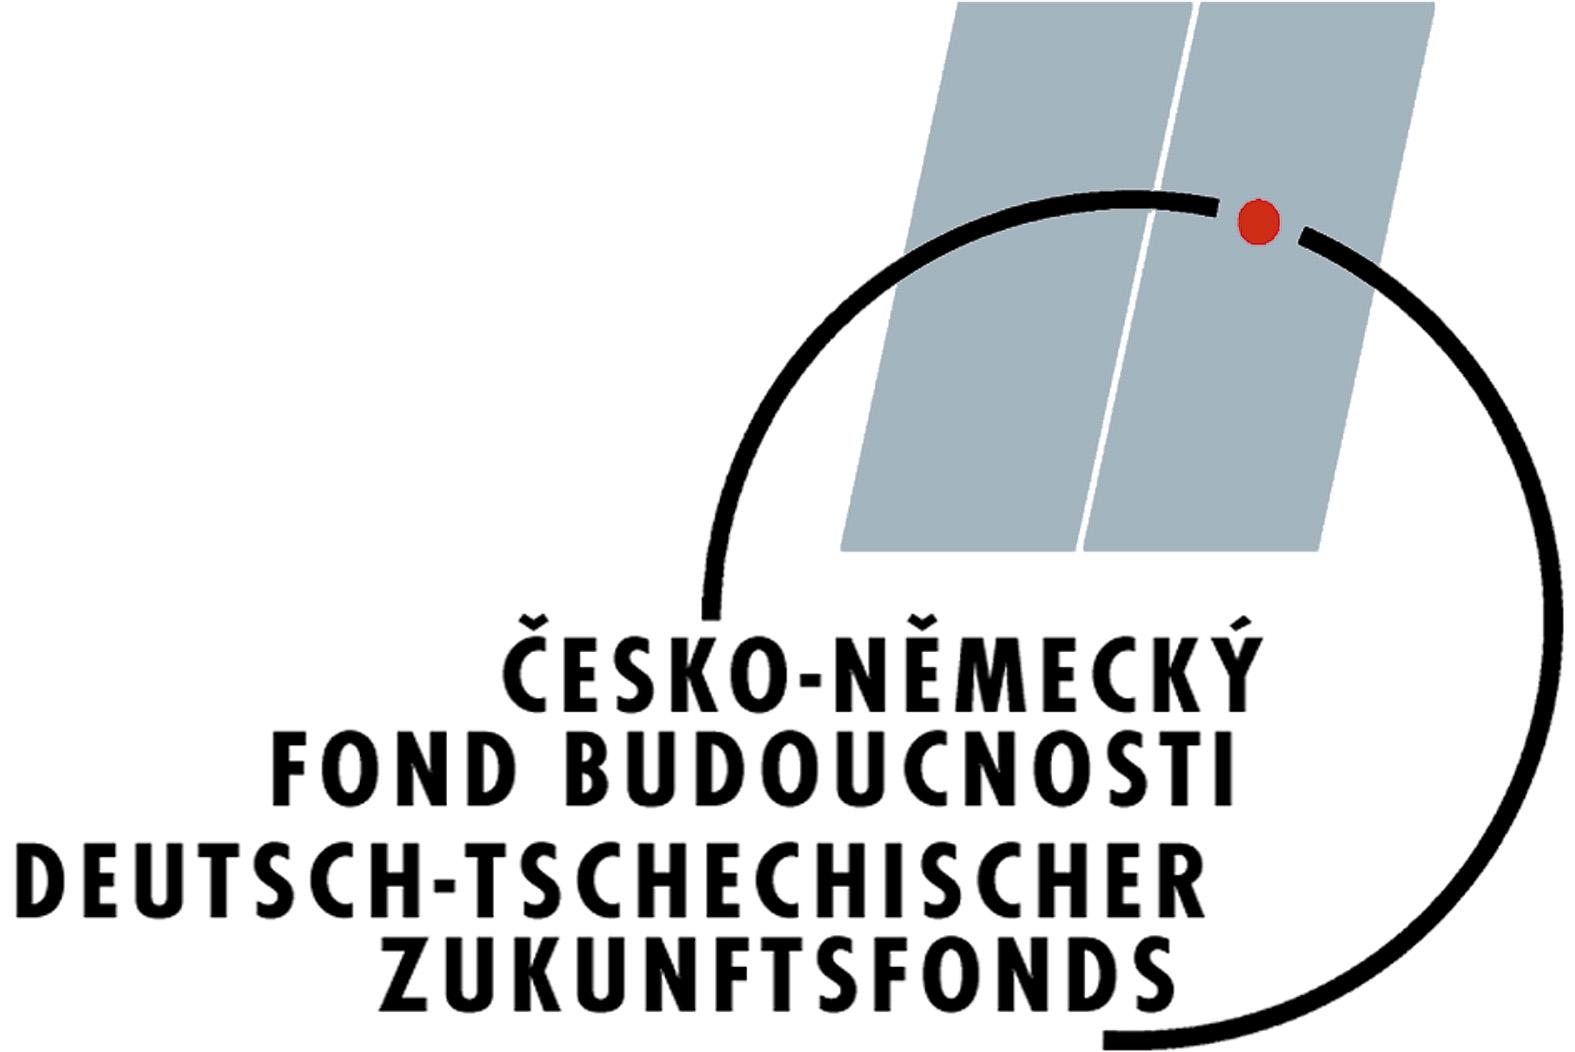 logo-barevne-ve-formatu-jpg (1)